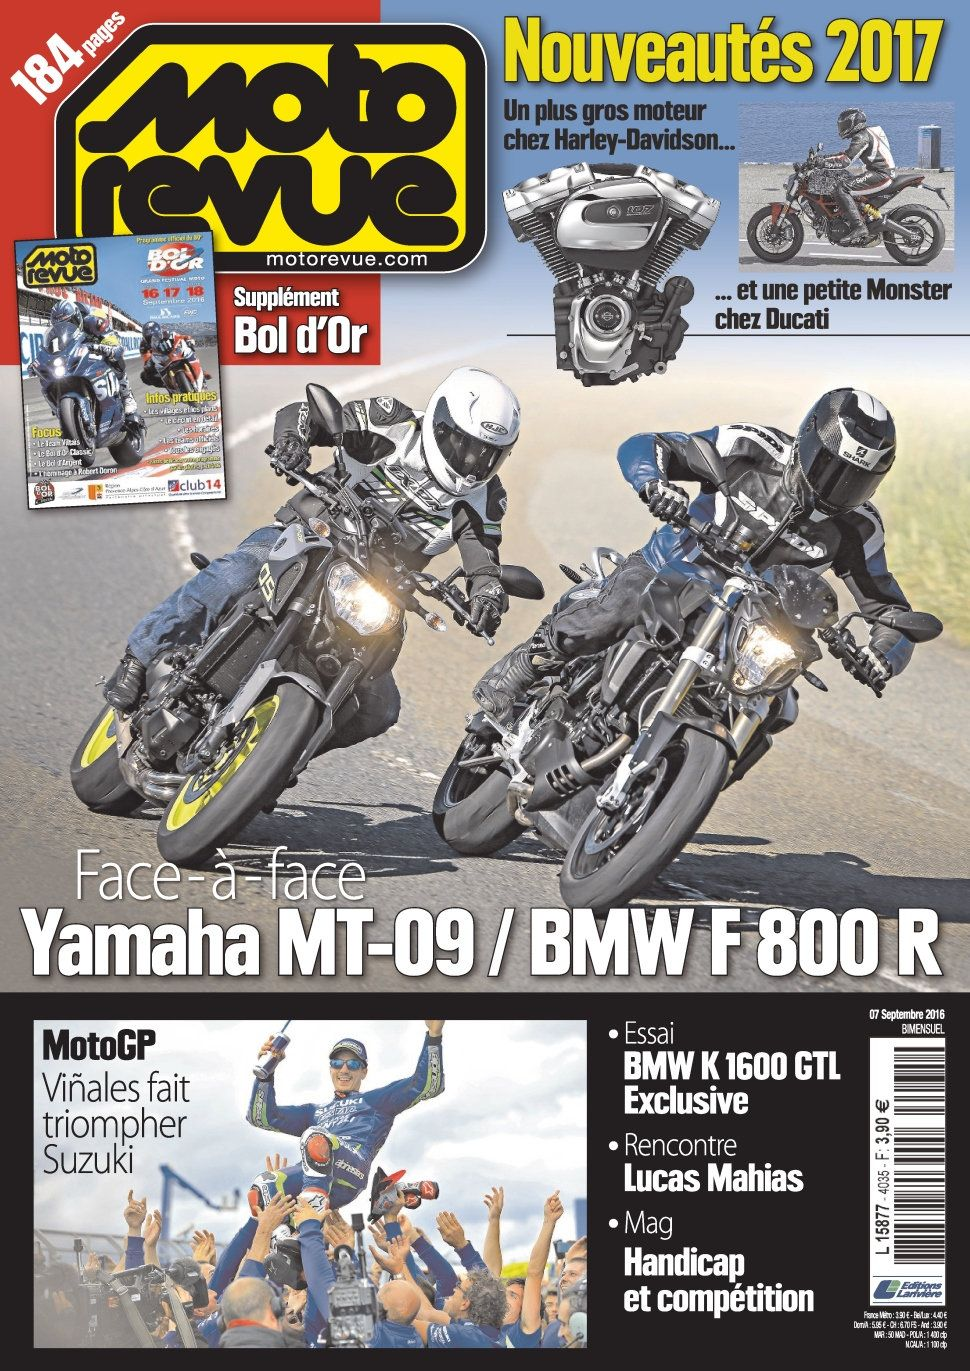 Moto Revue 4035 - 7 Septembre 2016